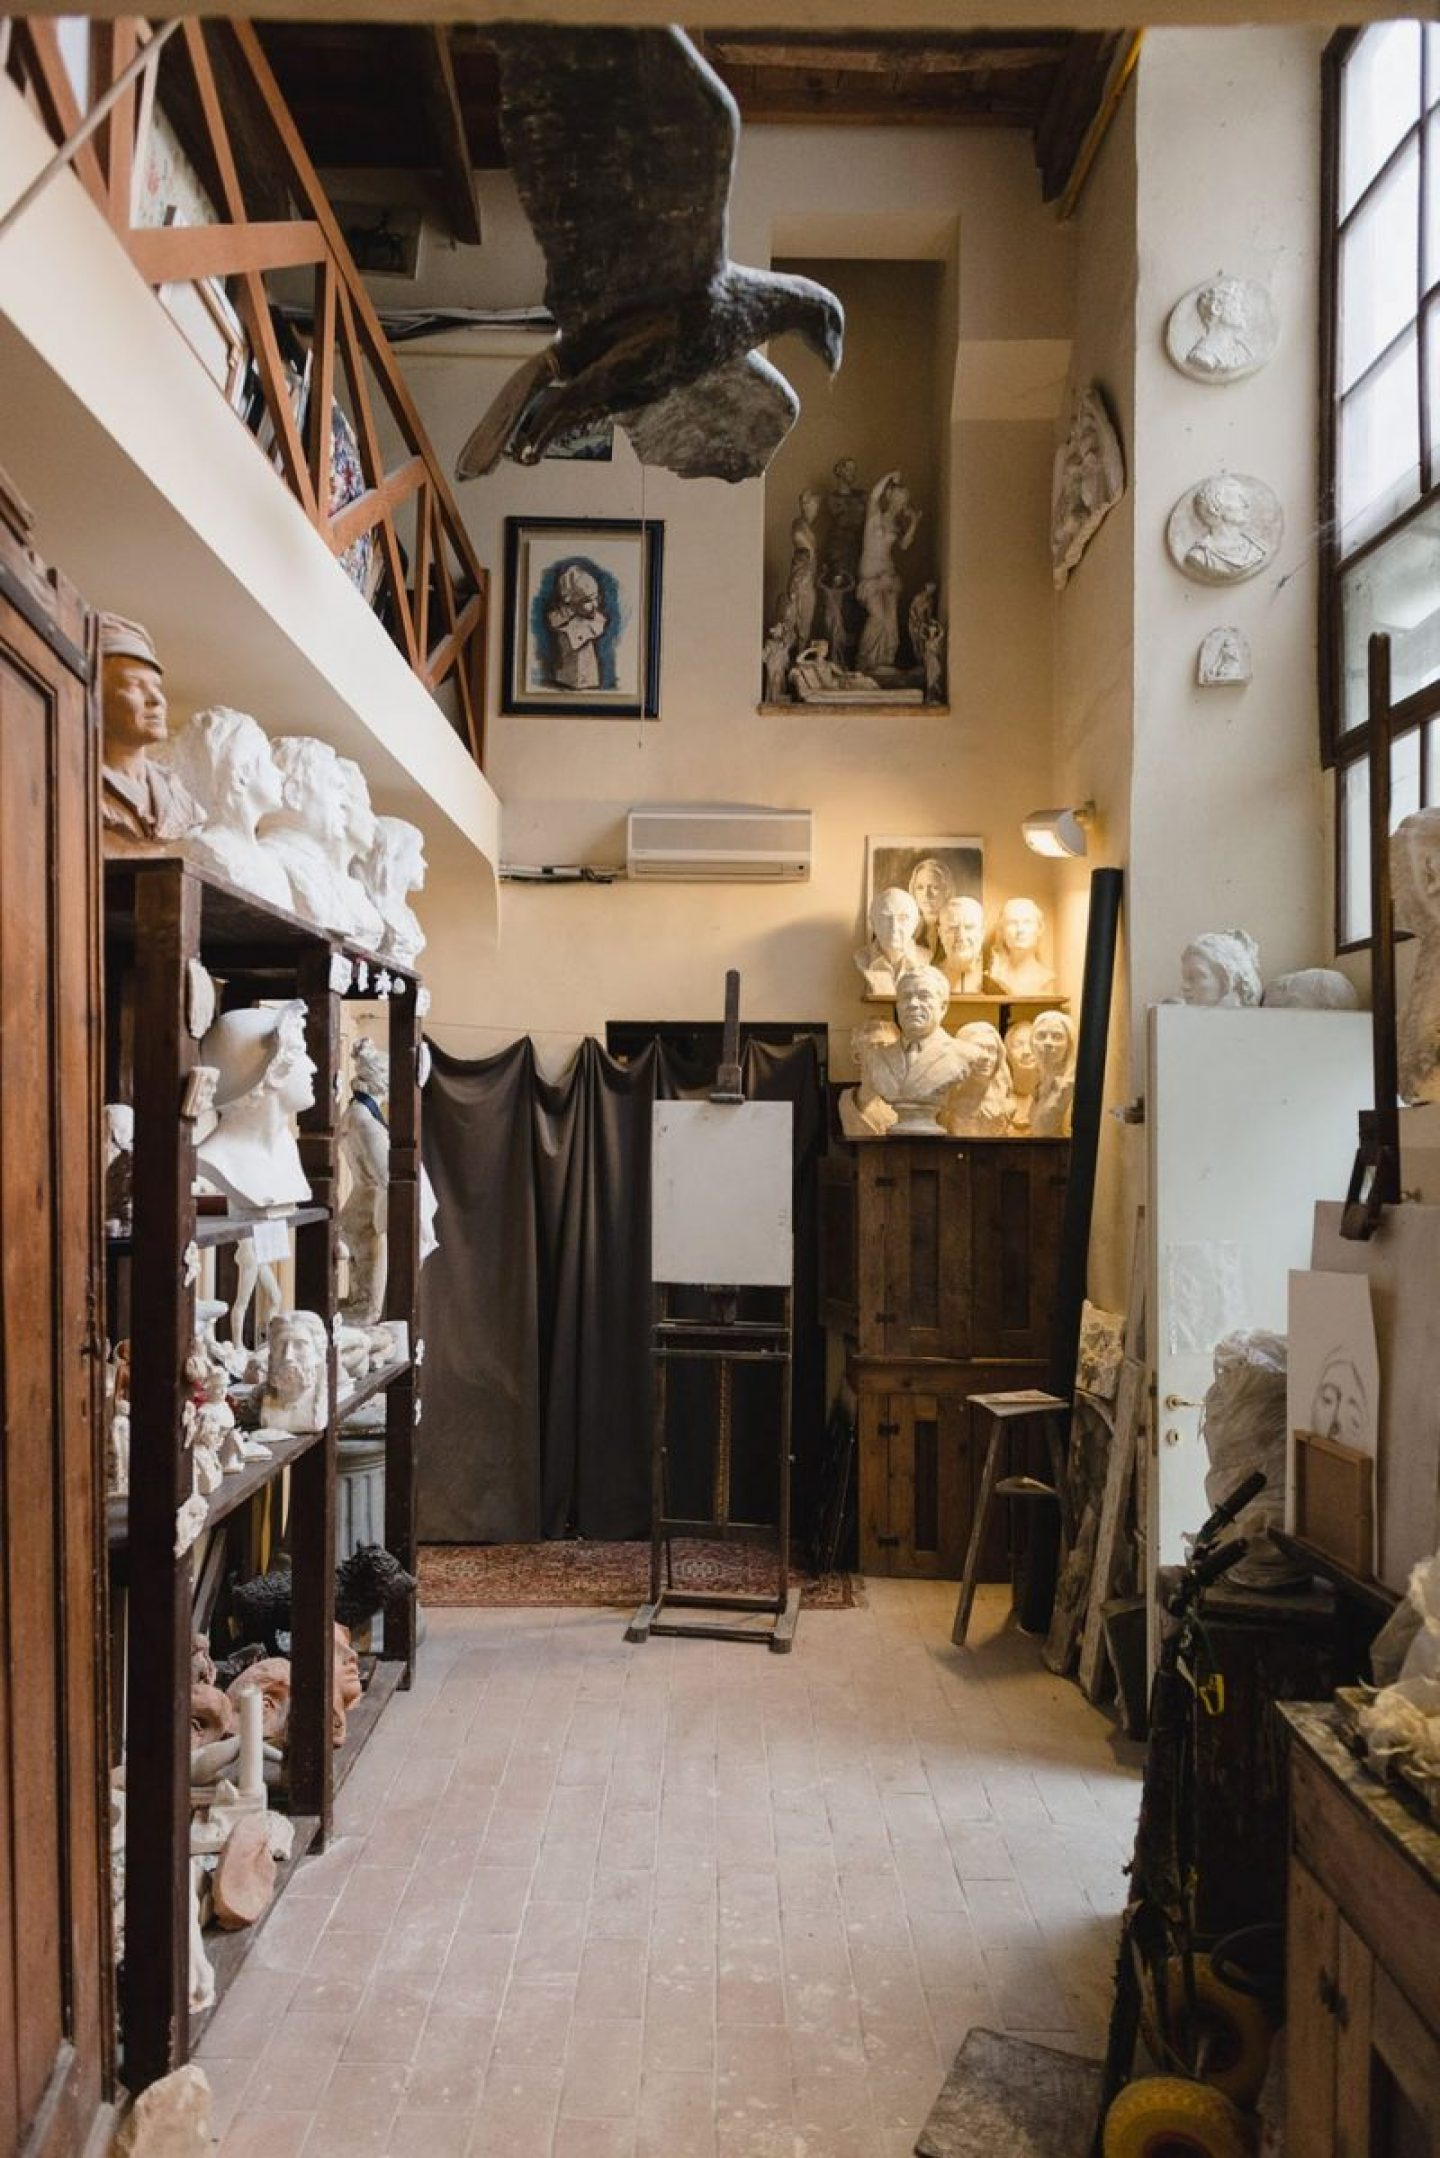 2017-09-15_ignant_a-lange-soehne_florenz_0446 Galleria Romanelli